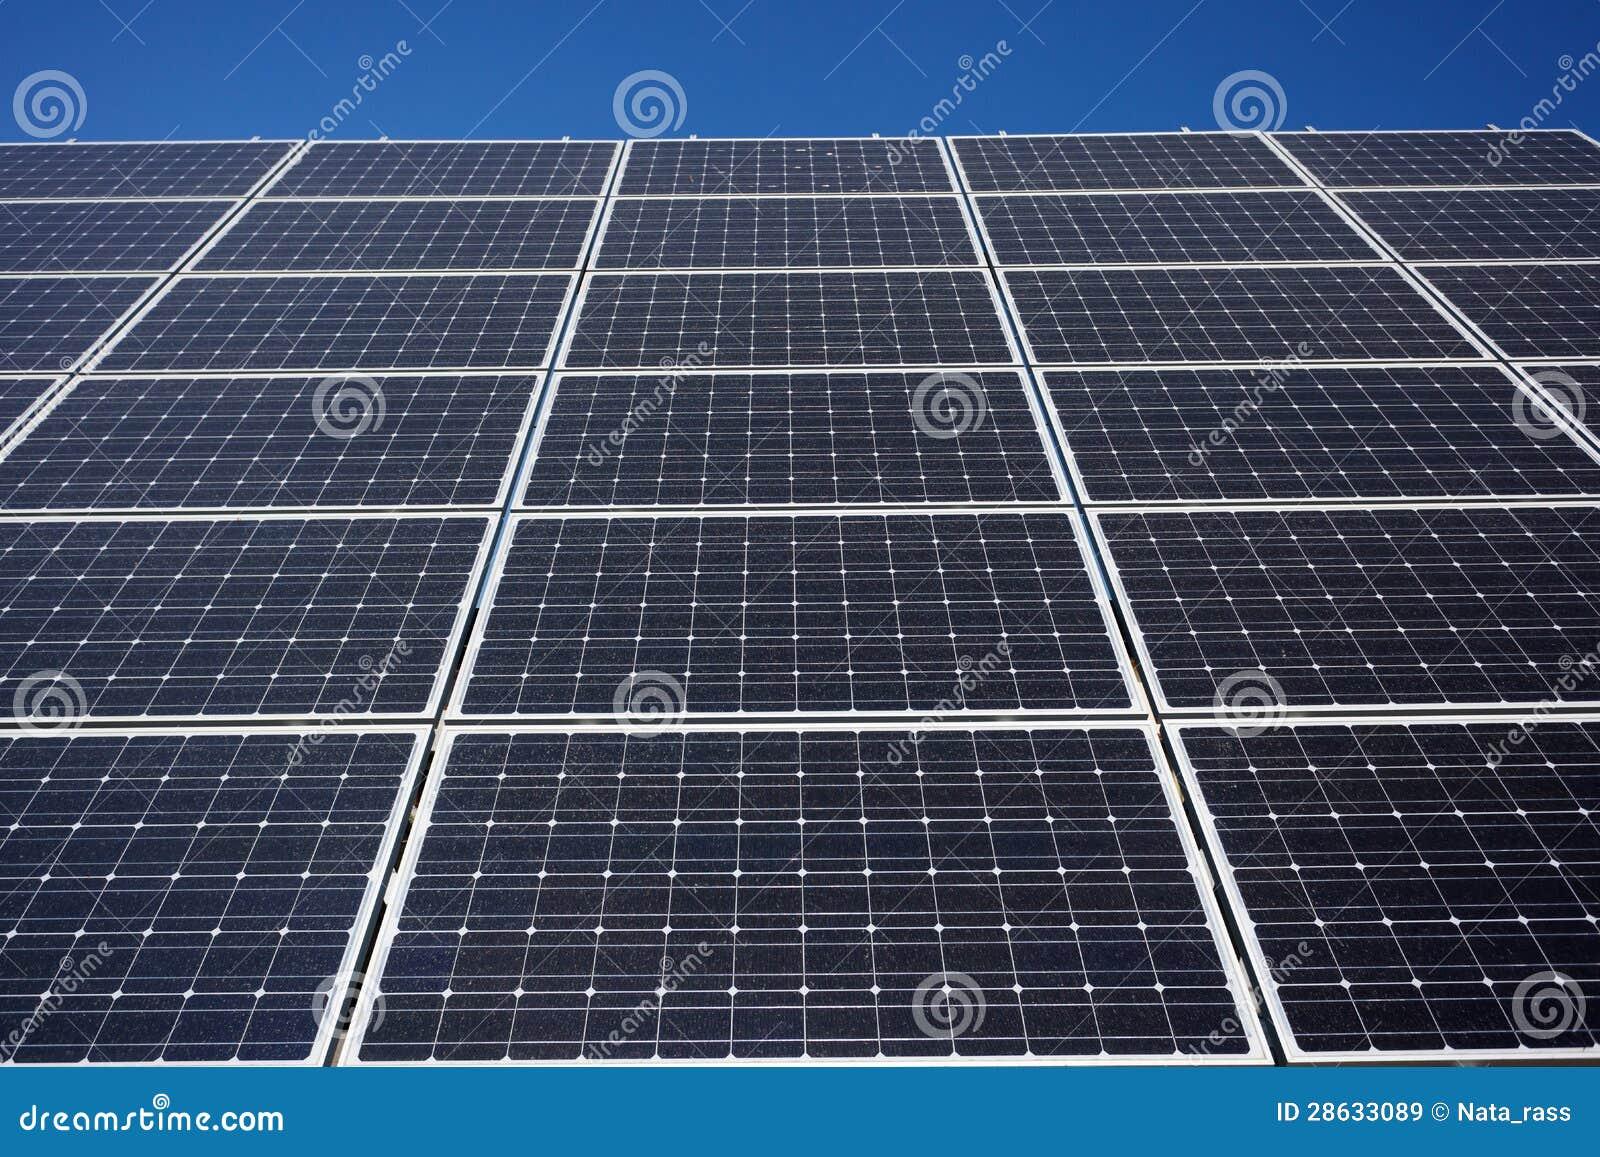 solar panel background - photo #13